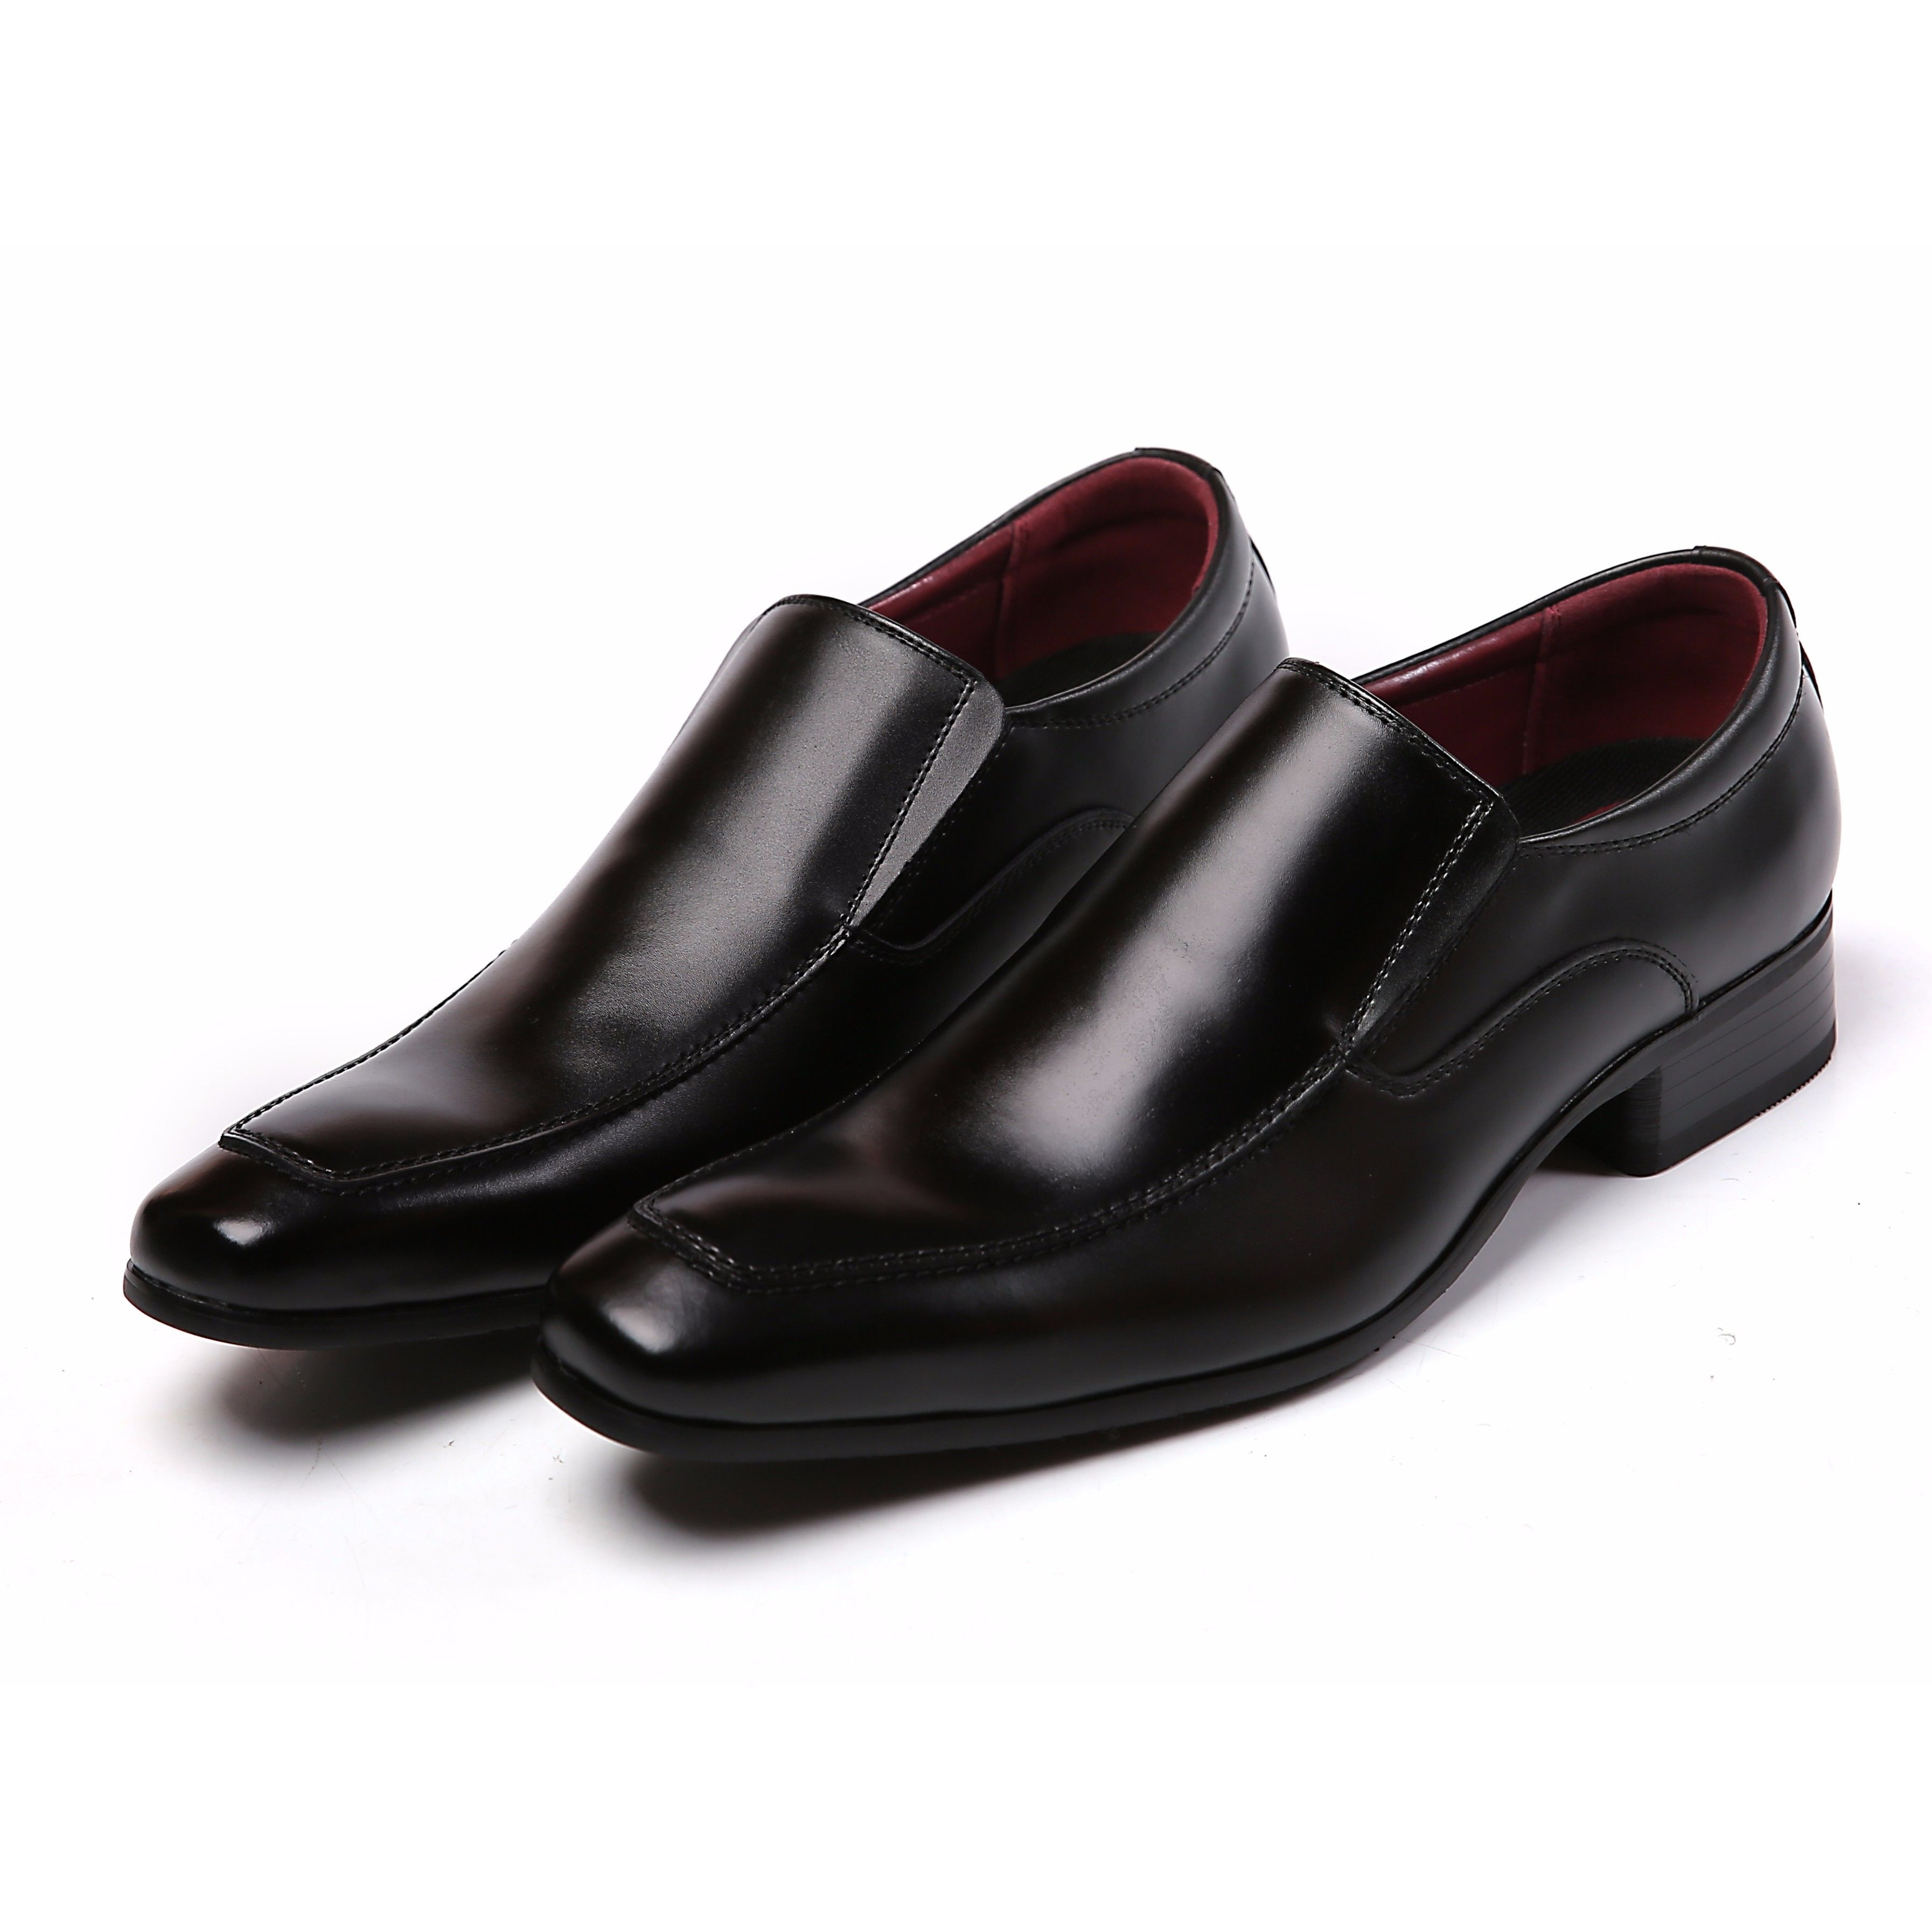 【Jo Marino】 高品質 本革 メンズ 革靴 ビジネスシューズ 紳士靴 防滑 撥水アッパー 高反発インソール 3E 多機能-777-BLACK